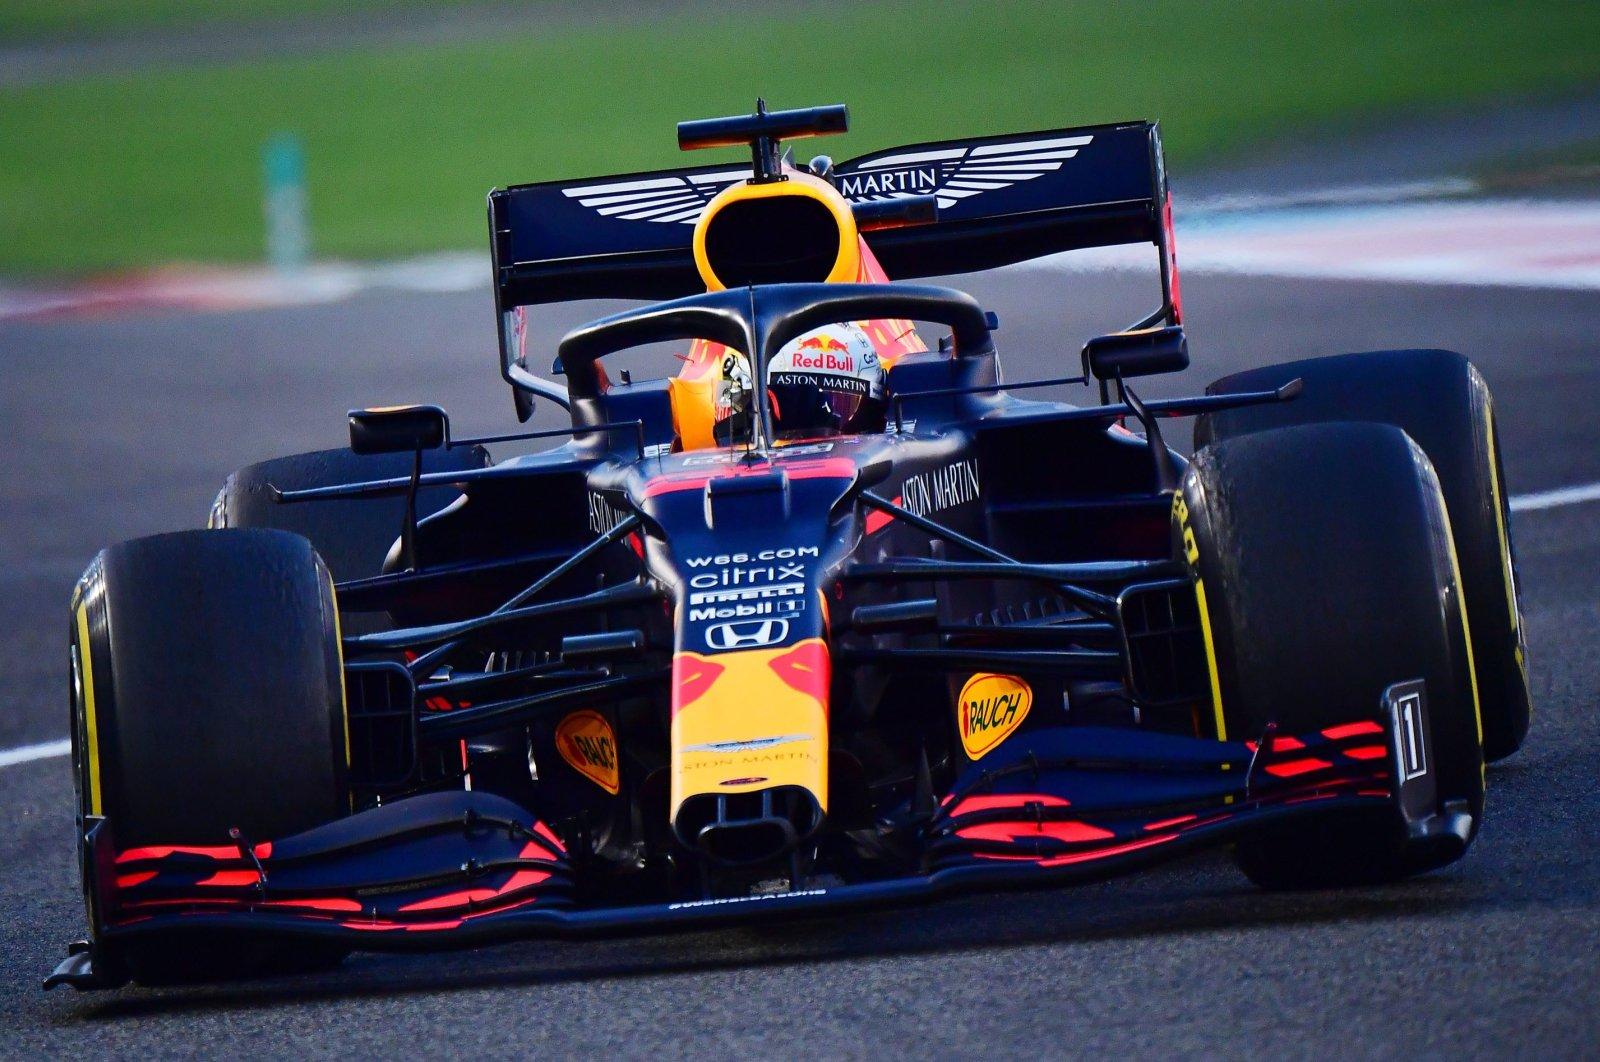 Red Bull's Max Verstappen in action during Formula One Abu Dhabi Grand Prix, Yas Marina Circuit, Abu Dhabi, United Arab Emirates, Dec. 13, 2020. (Reuters Photo)